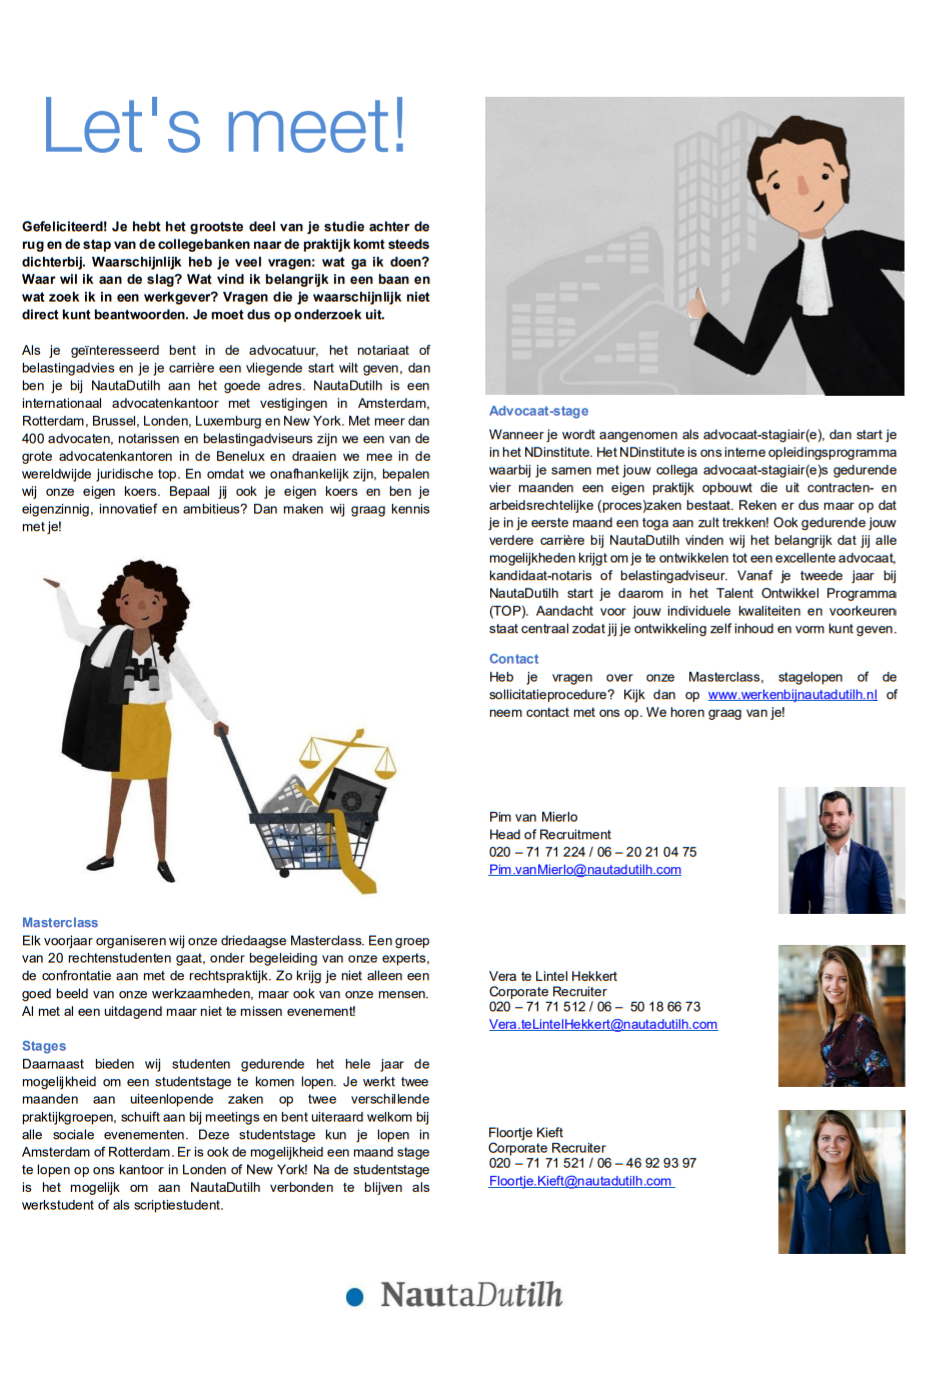 screencapture-file-C-Users-Selina-Pictures-BNSL-LOGO-Kantoorprofiel-NautaDutilh-2020-2021-pdf-2020-12-07-14_44_46_2.png